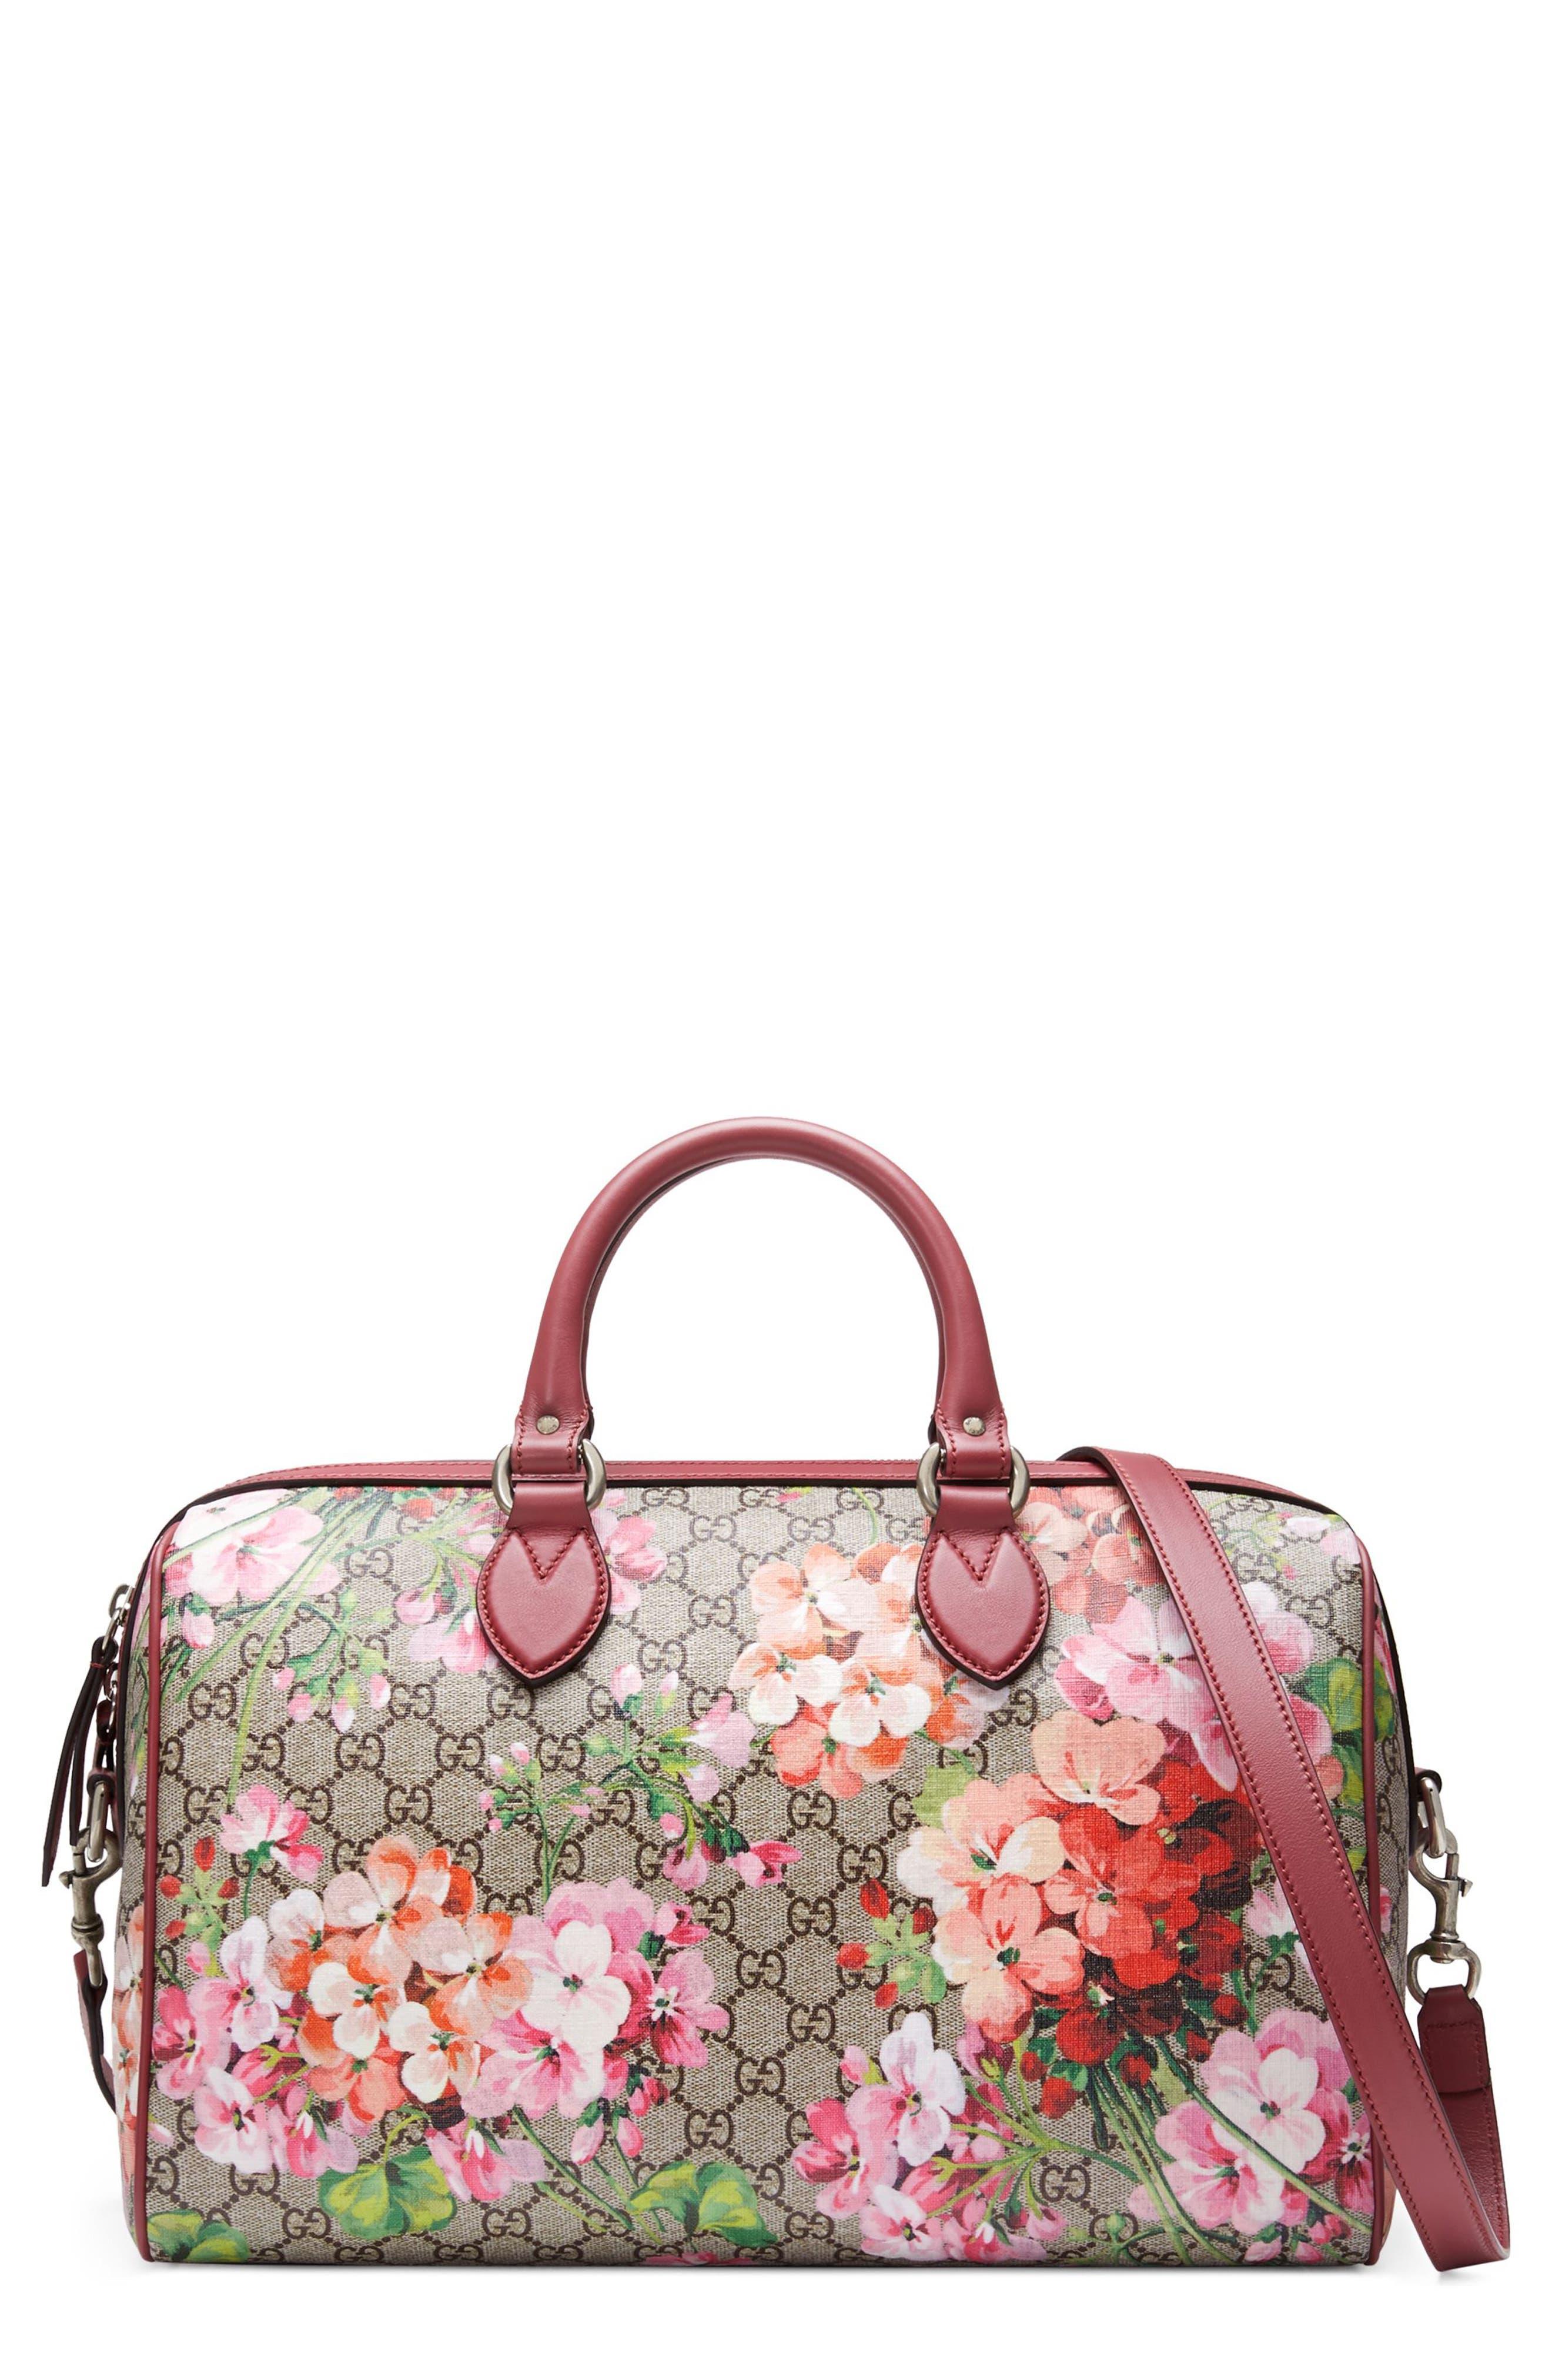 GUCCI Medium Blooms GG Supreme Top Handle Canvas Bag